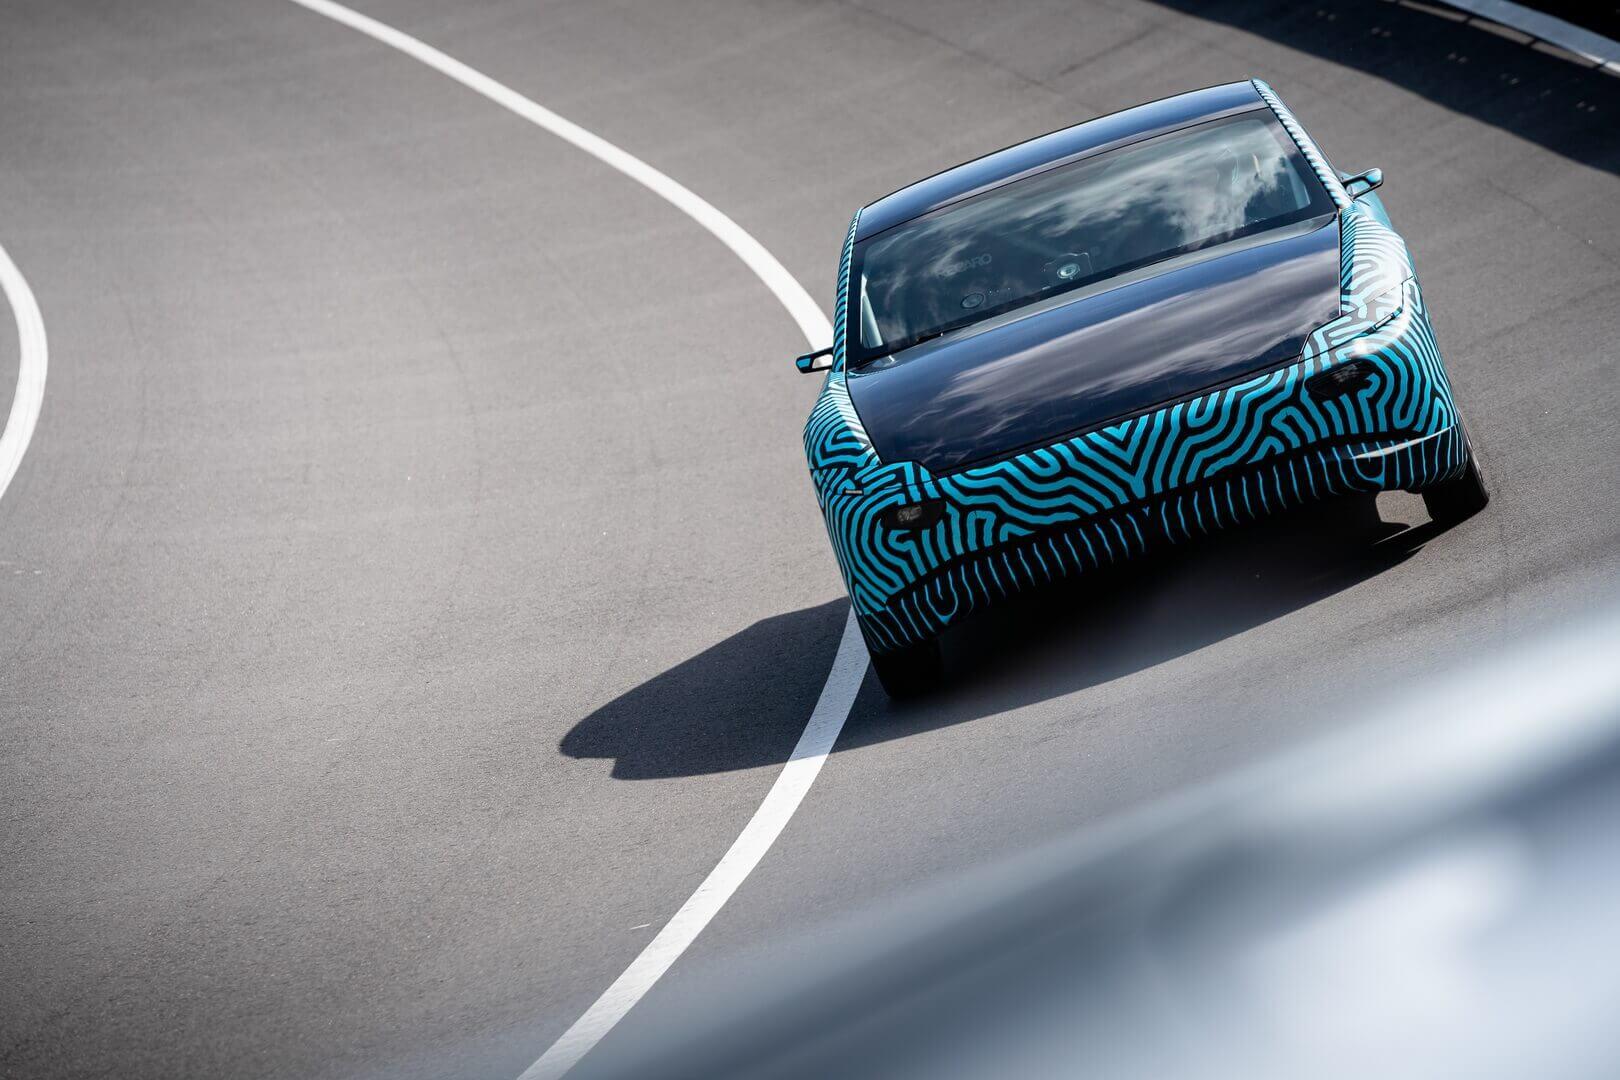 Прототип электромобиля насолнечных батареях Lightyear One проехал 710км наодной зарядке аккумулятора